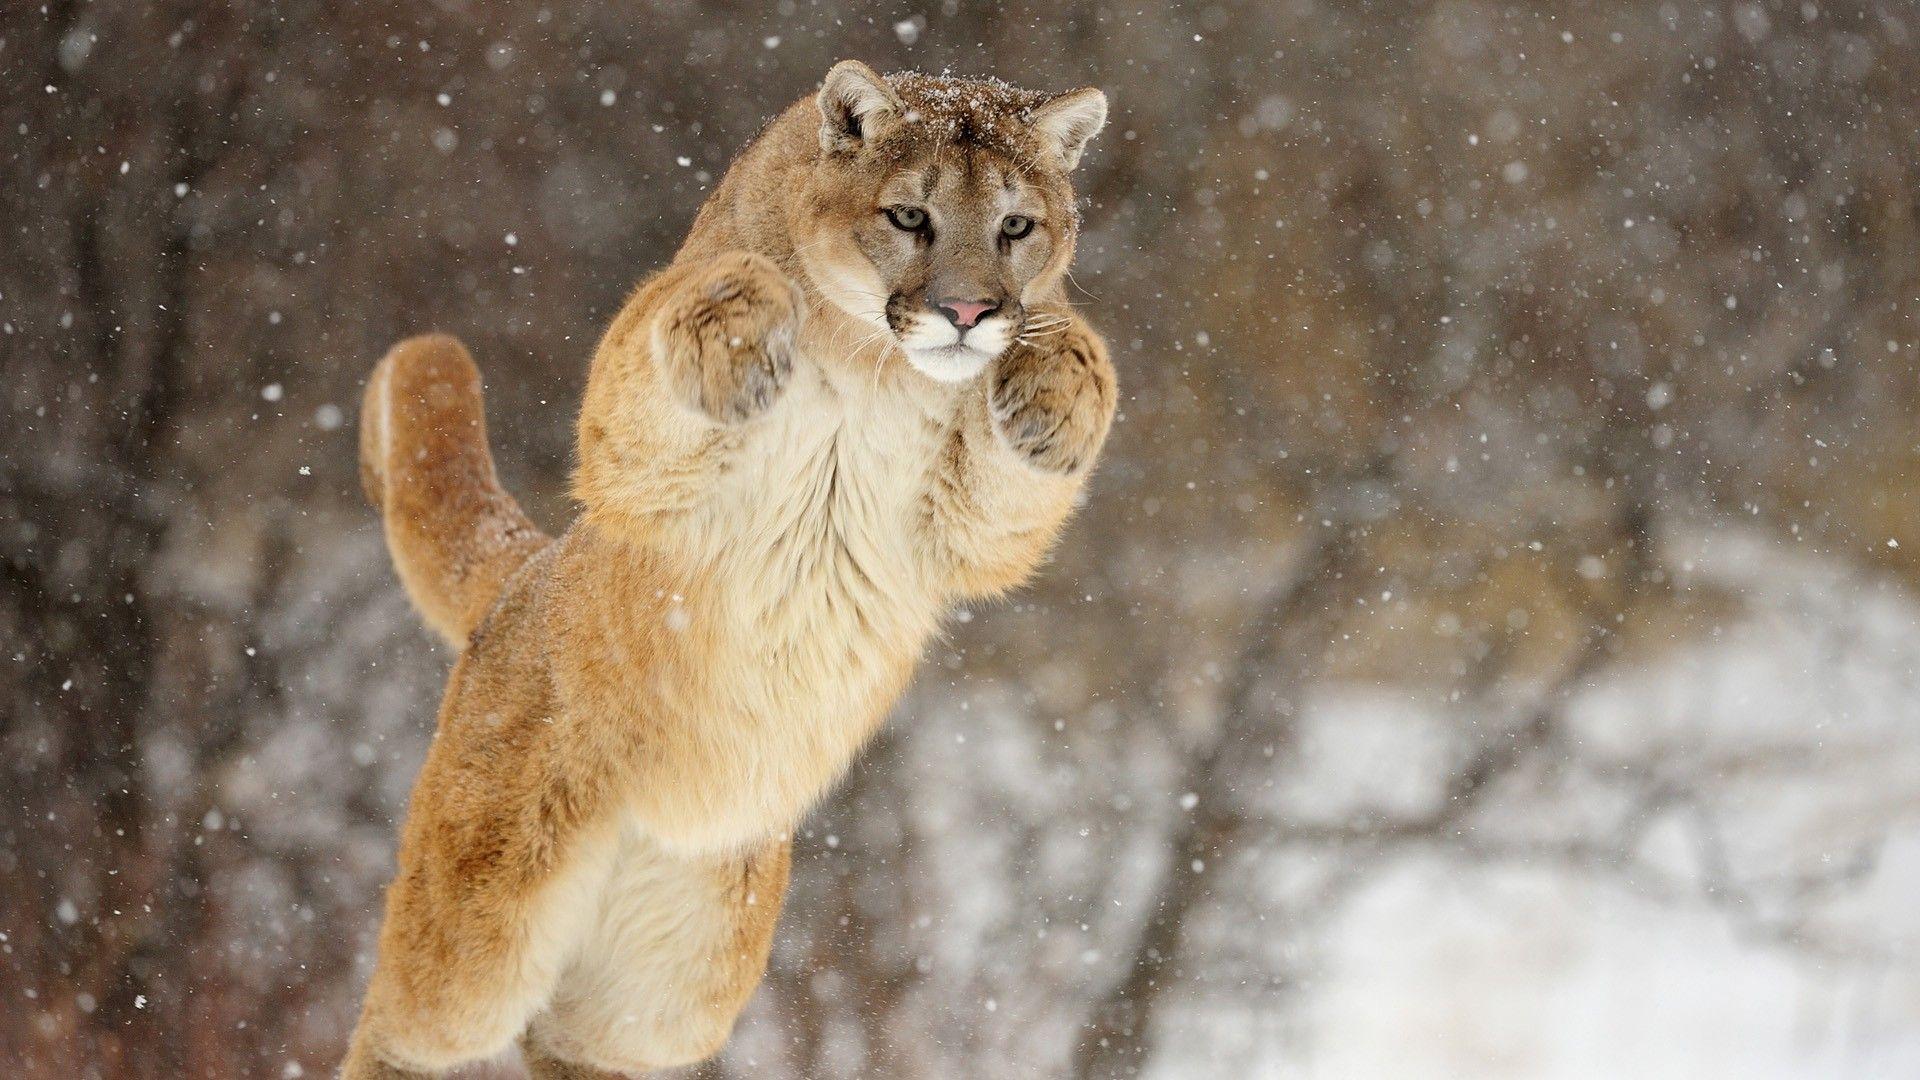 Cougar Hd nice wallpaper